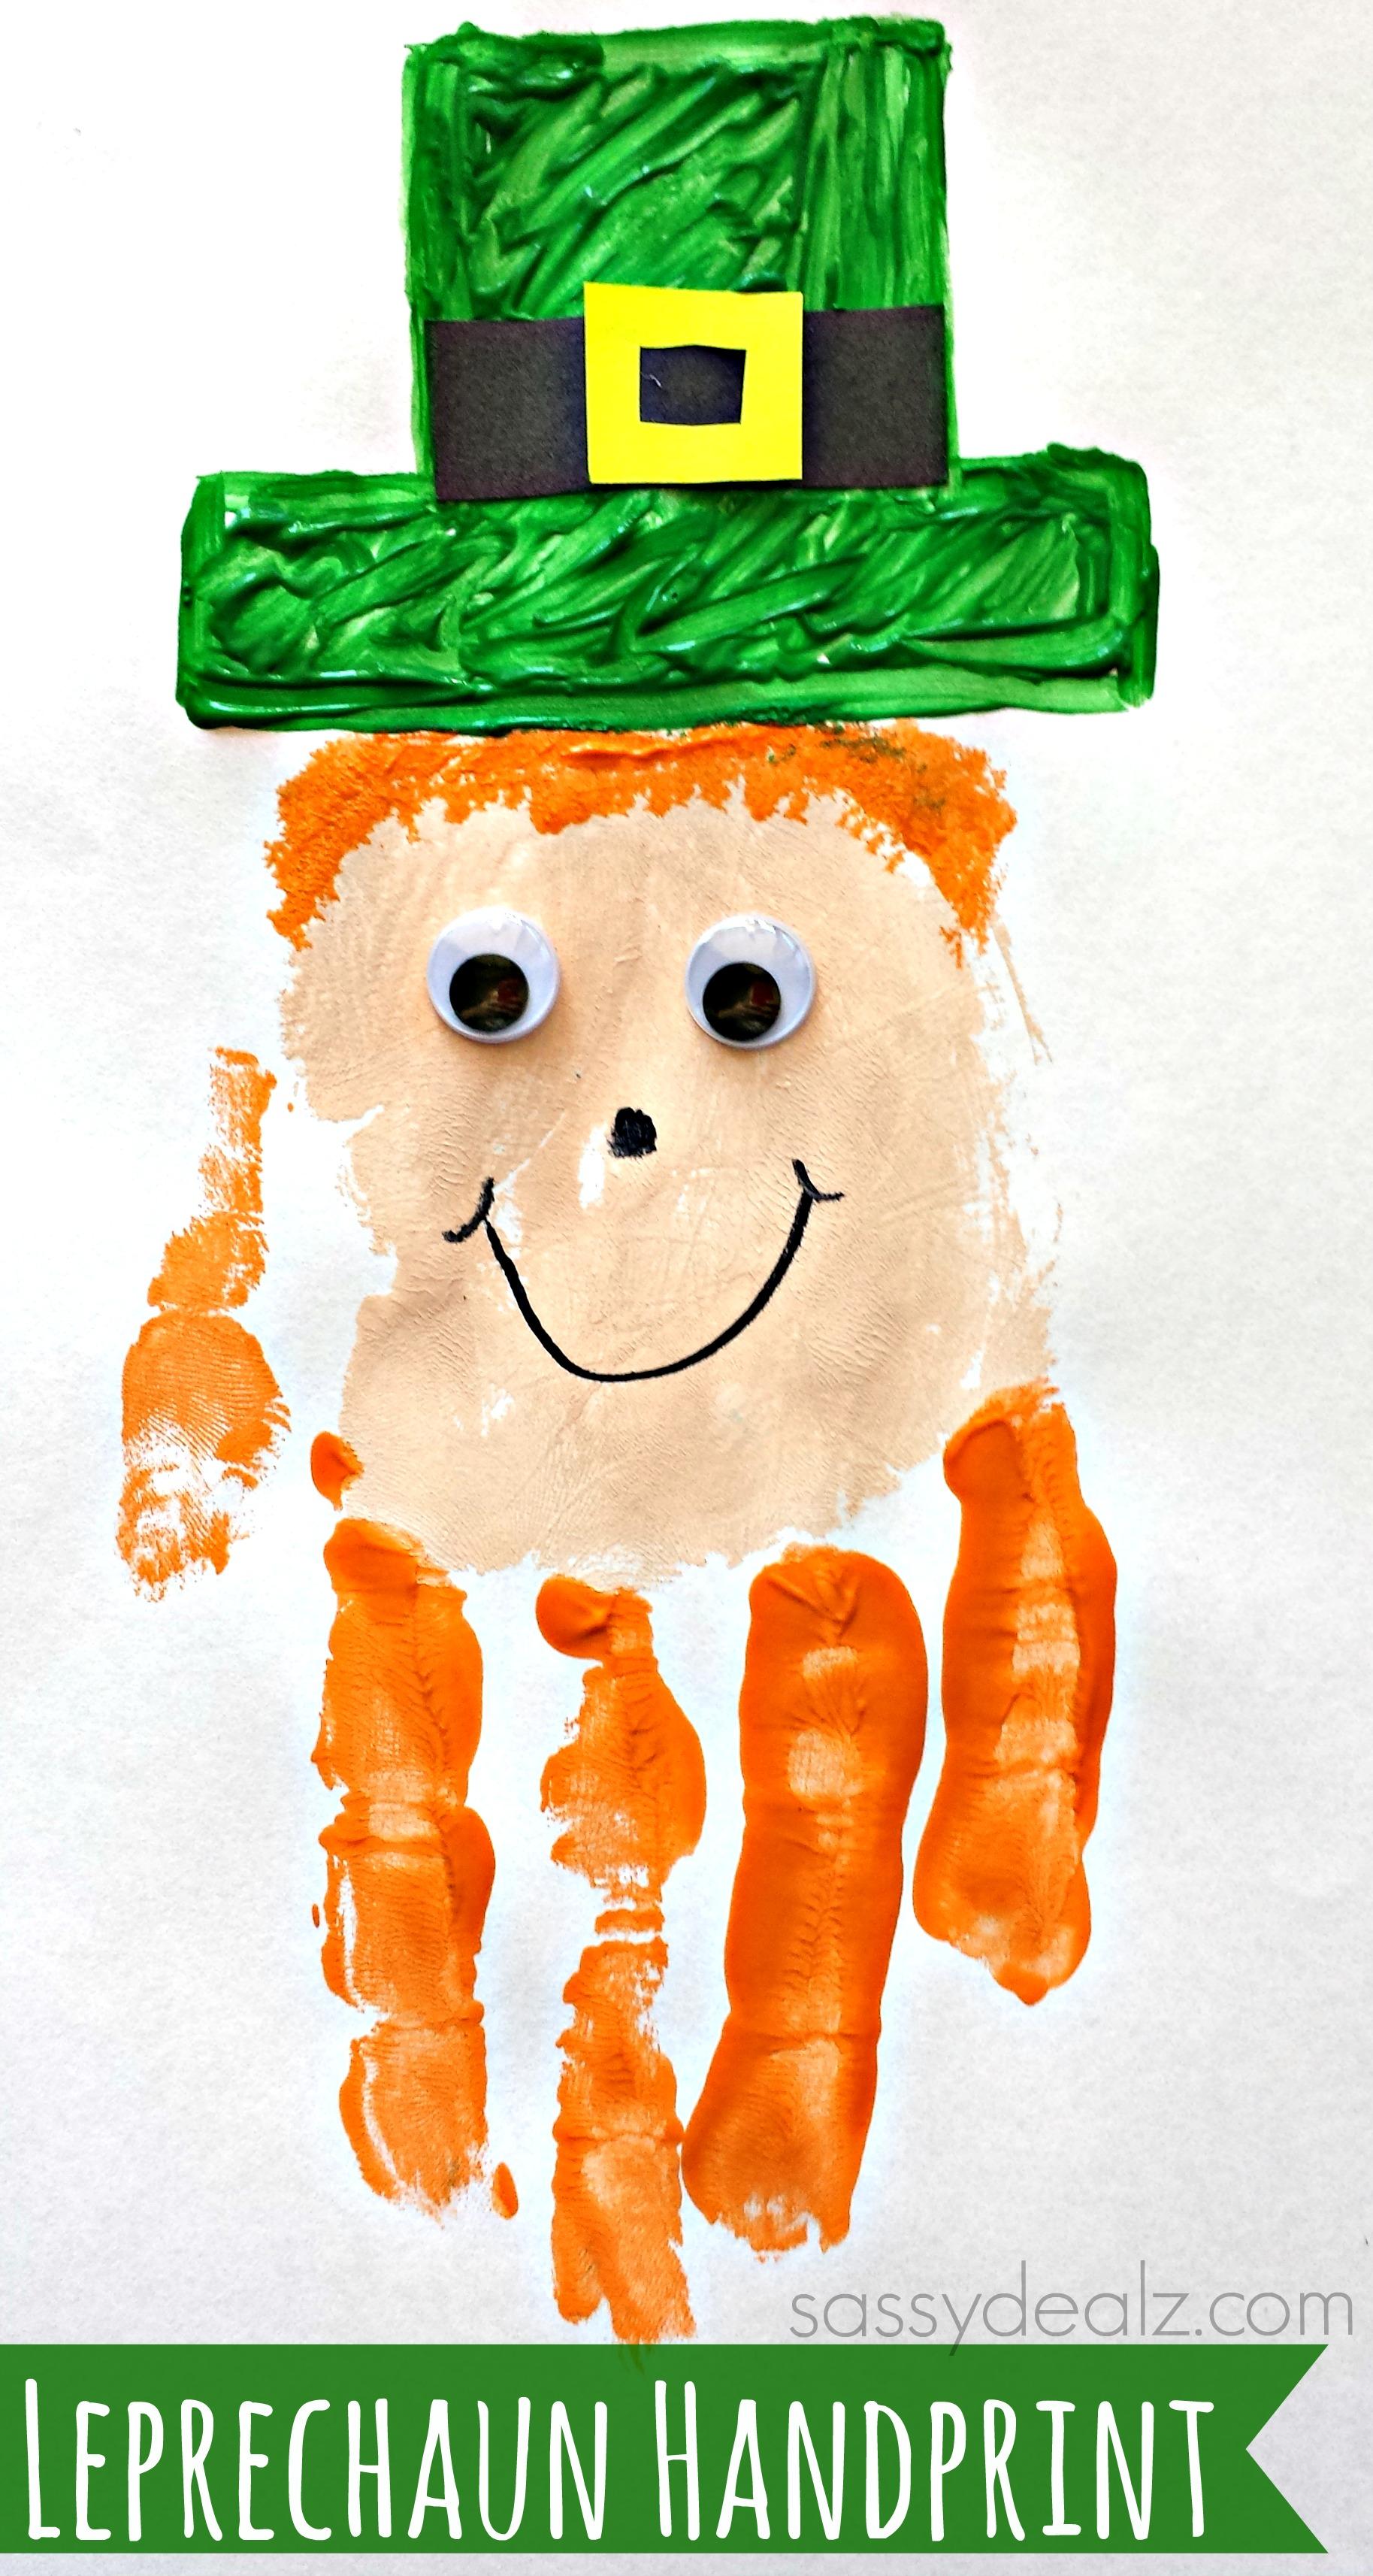 Uncategorized Leprechaun Kids leprechaun handprint craft for kids st patricks day idea craft